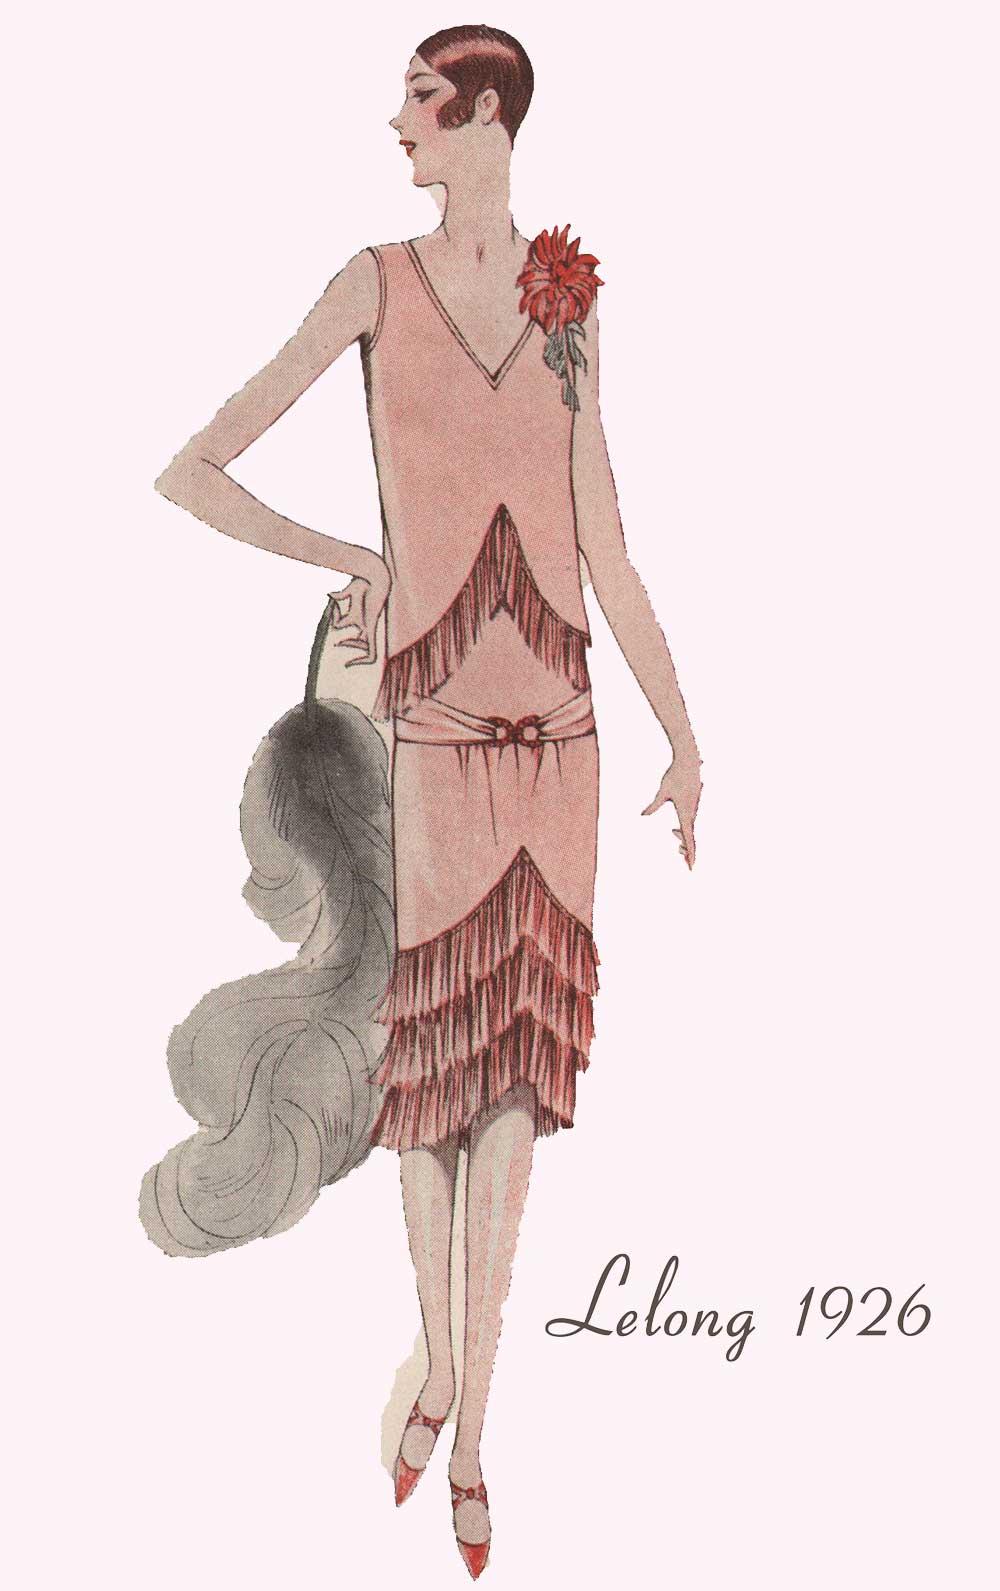 Fashion-News-1920s---Evening-Frocks-for-19261-Lelong